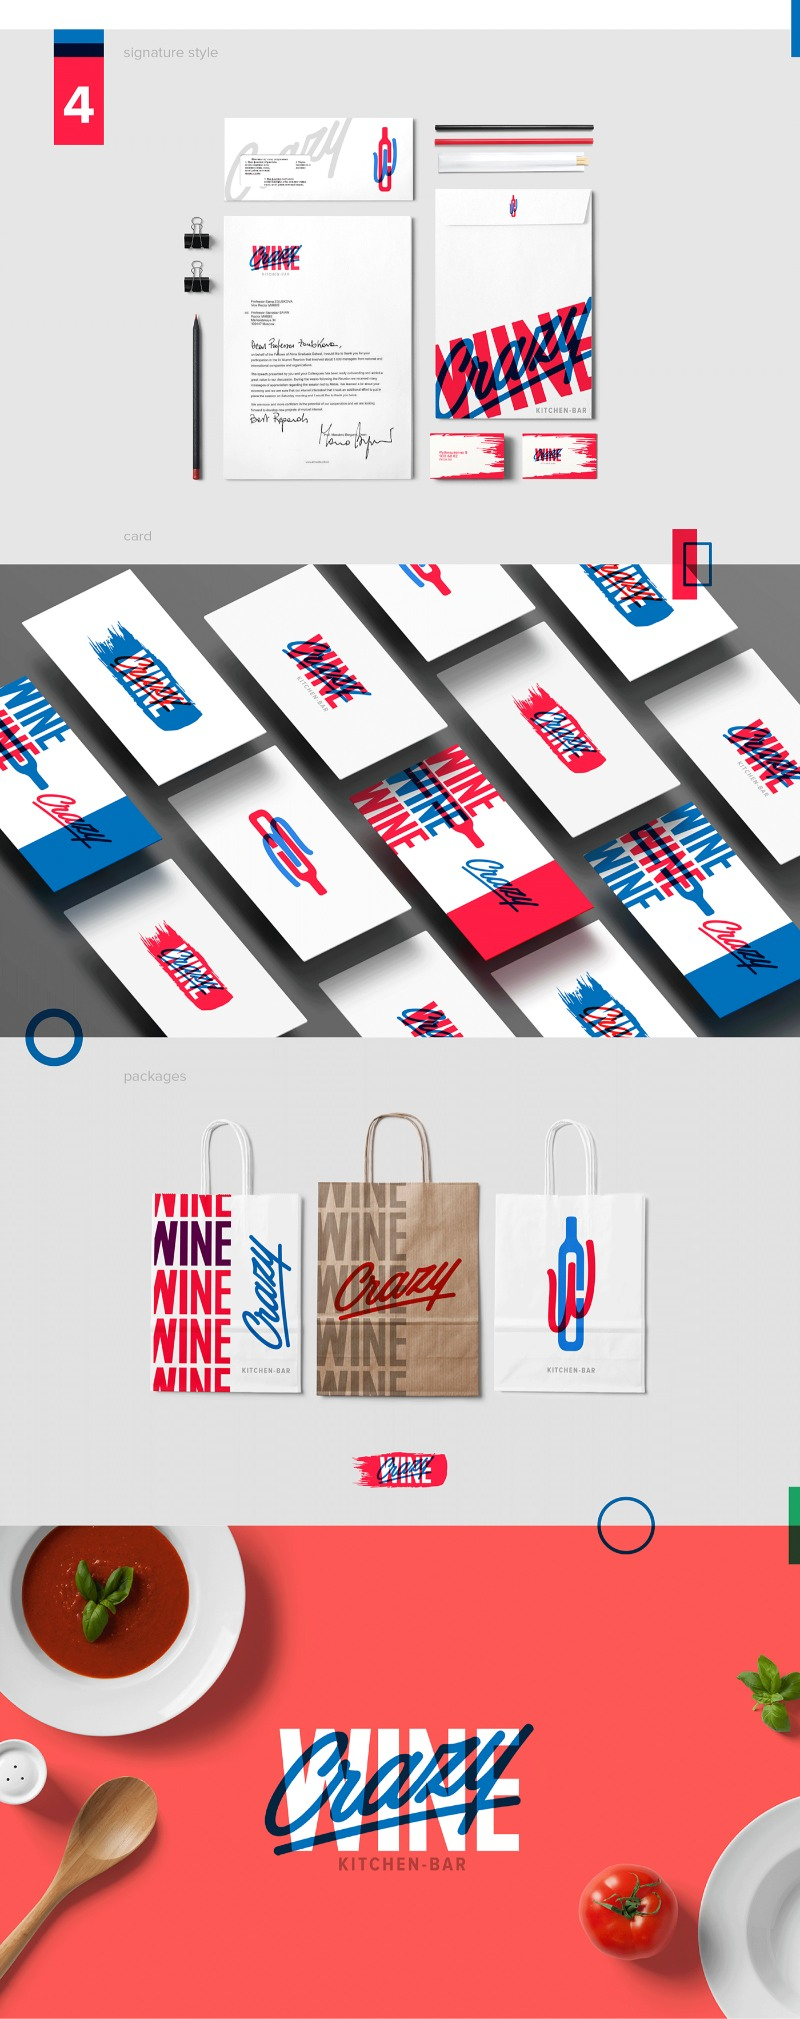 30 Wine Label Design Inspiration & Branding Examples #corporatedesign